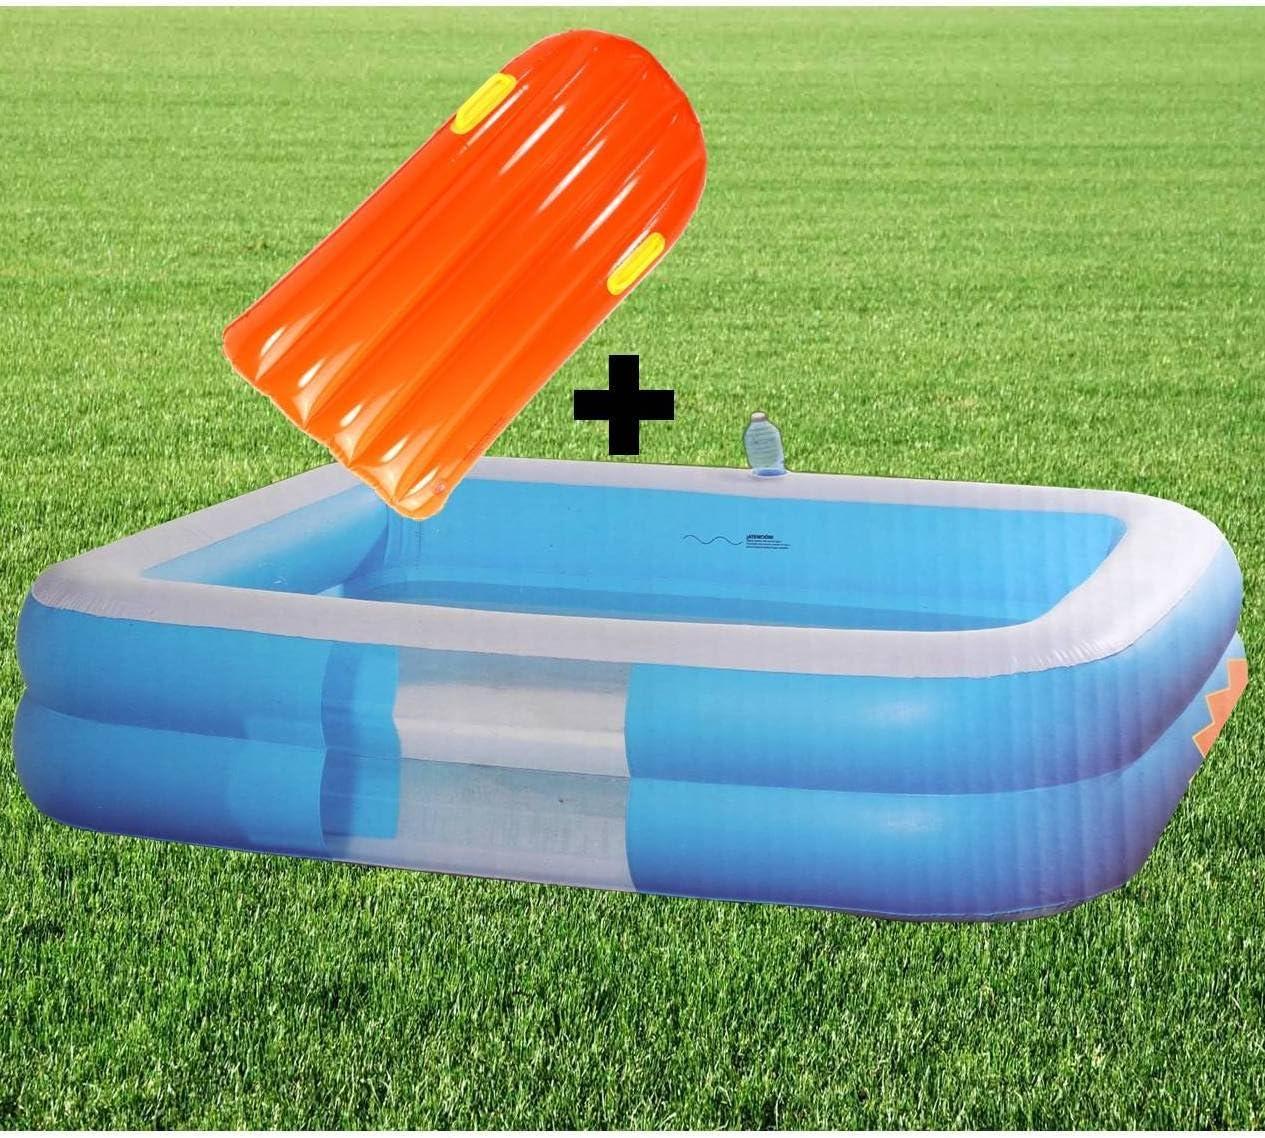 Jumbo Pool planschbecken + Tarjeta de Deslizamiento Piscina 196 cm niño Piscina Hinchable ~ MP 169 +: Amazon.es: Jardín